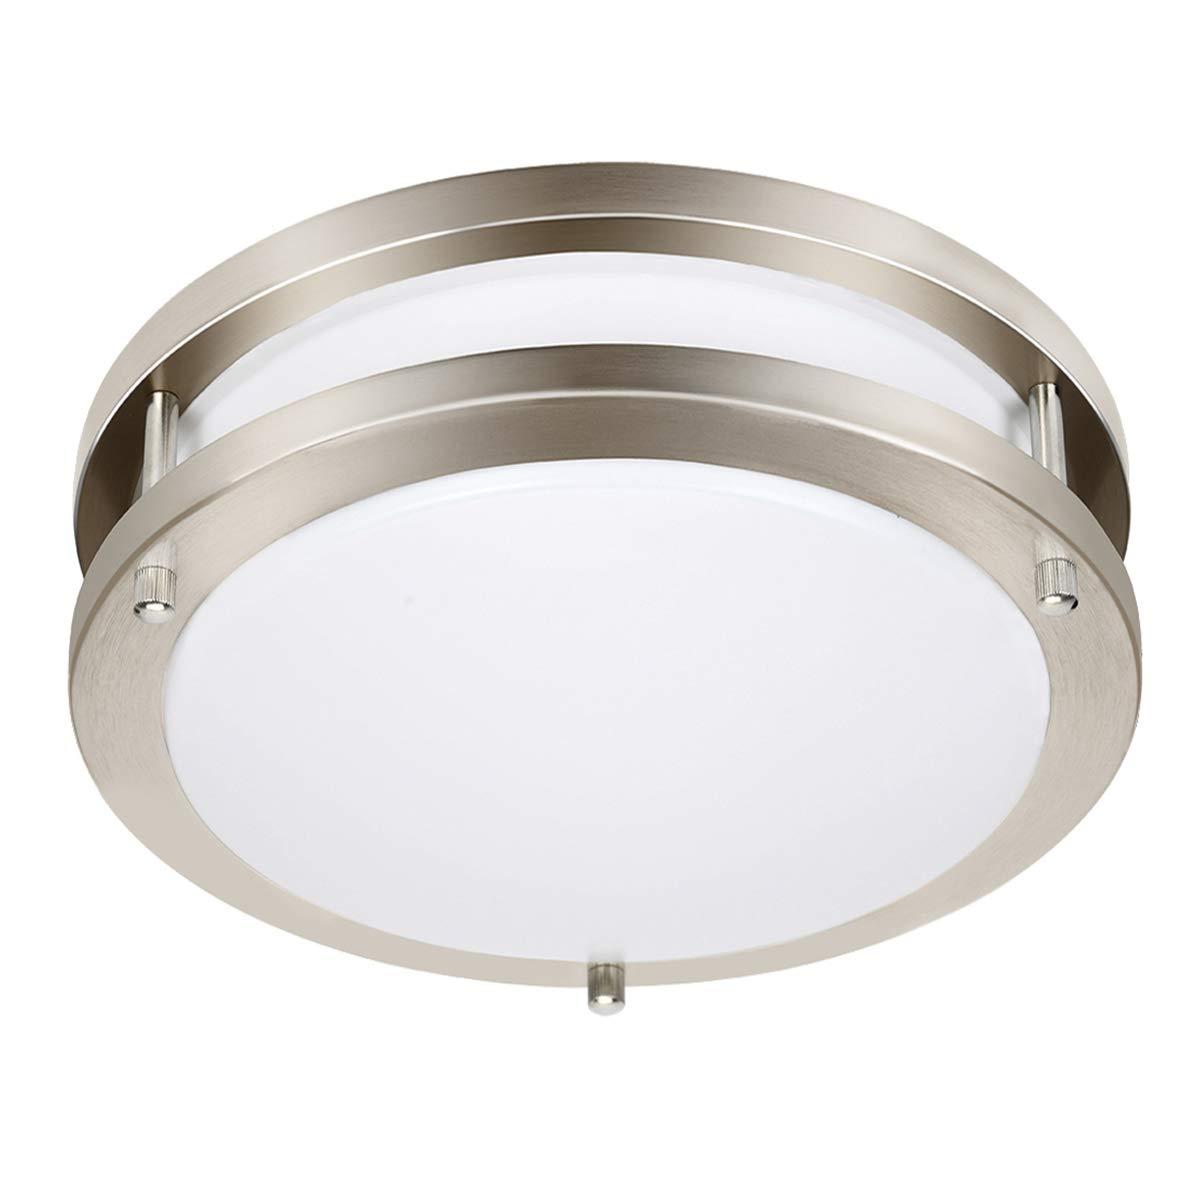 Drosbey 9W Flush Mount Ceiling Light Fixture, Kitchen Light